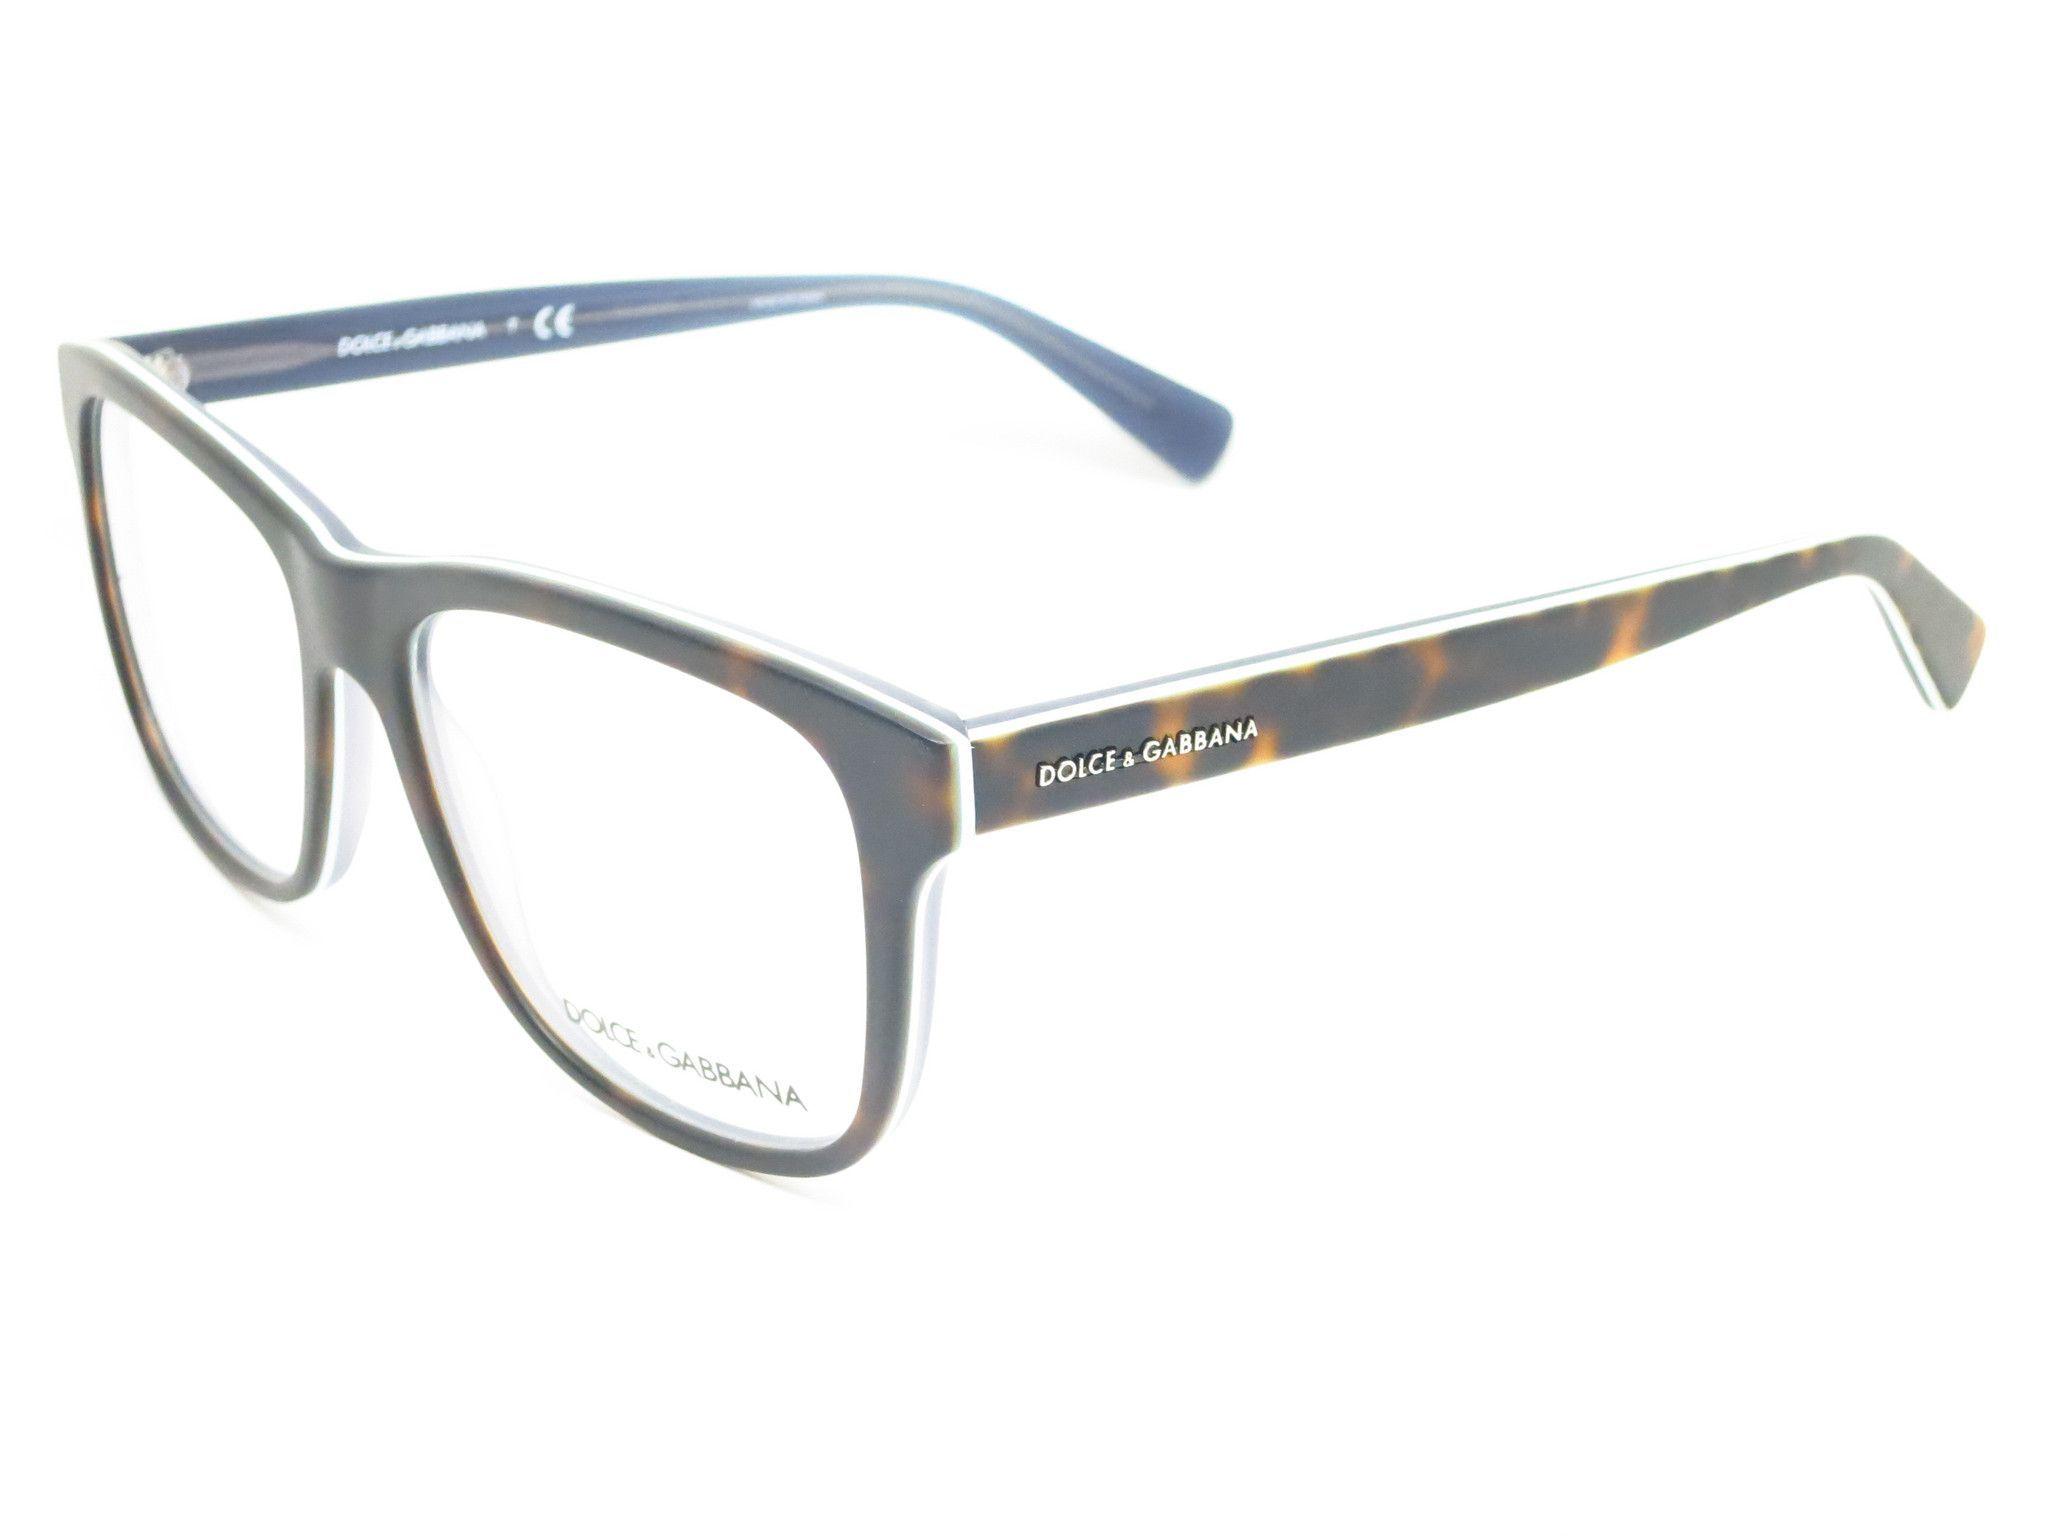 4fa8b89c30 Dolce   Gabbana DG 3206 Top Havana on Matte Petroleum 2867 Eyeglasses